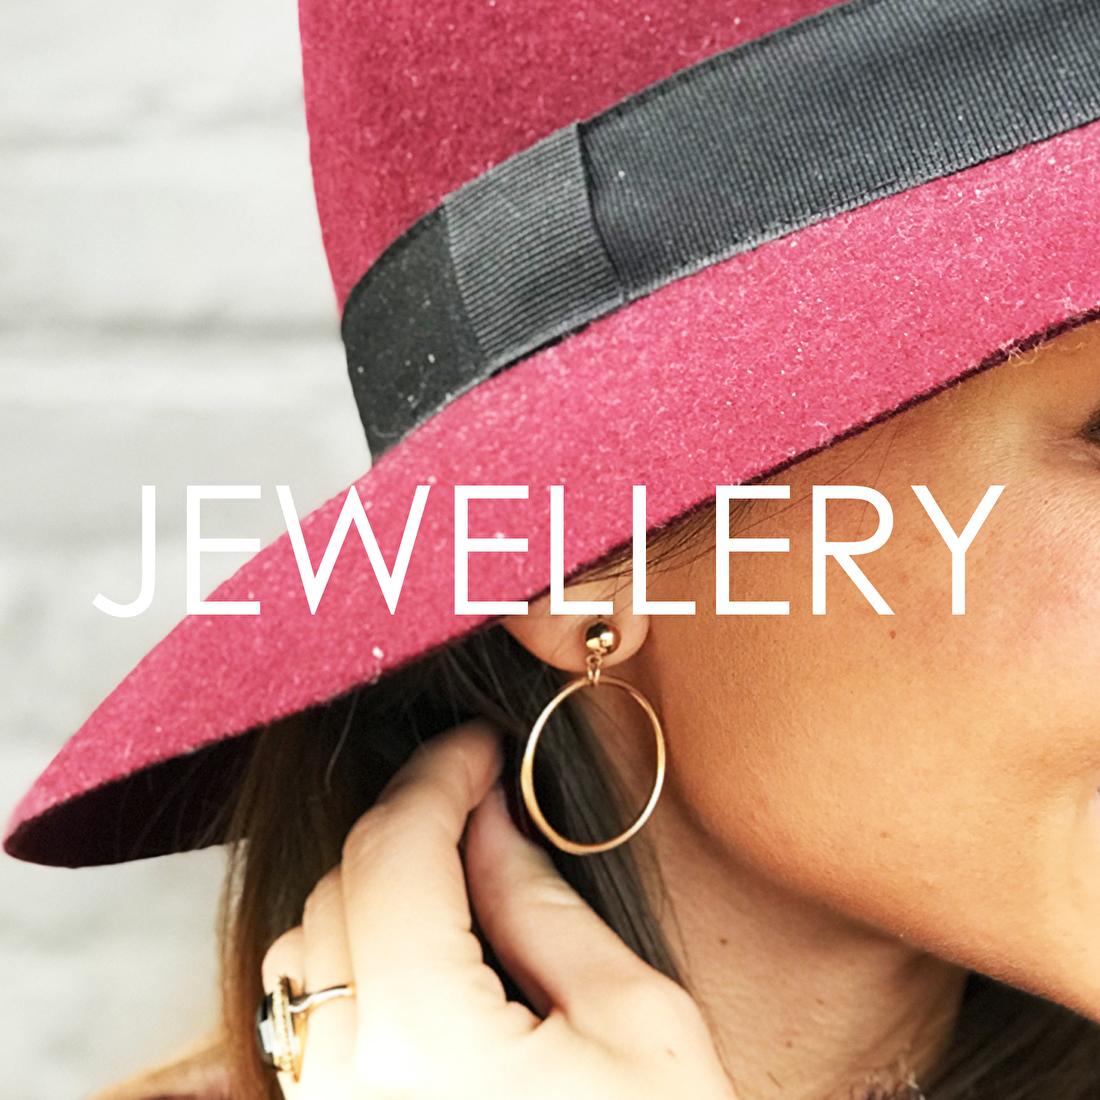 01122017_Homepage_jewellery.jpg?t=1512153804&_ga=2.48367782.1023992587.1512144588-1310004648.1498762867